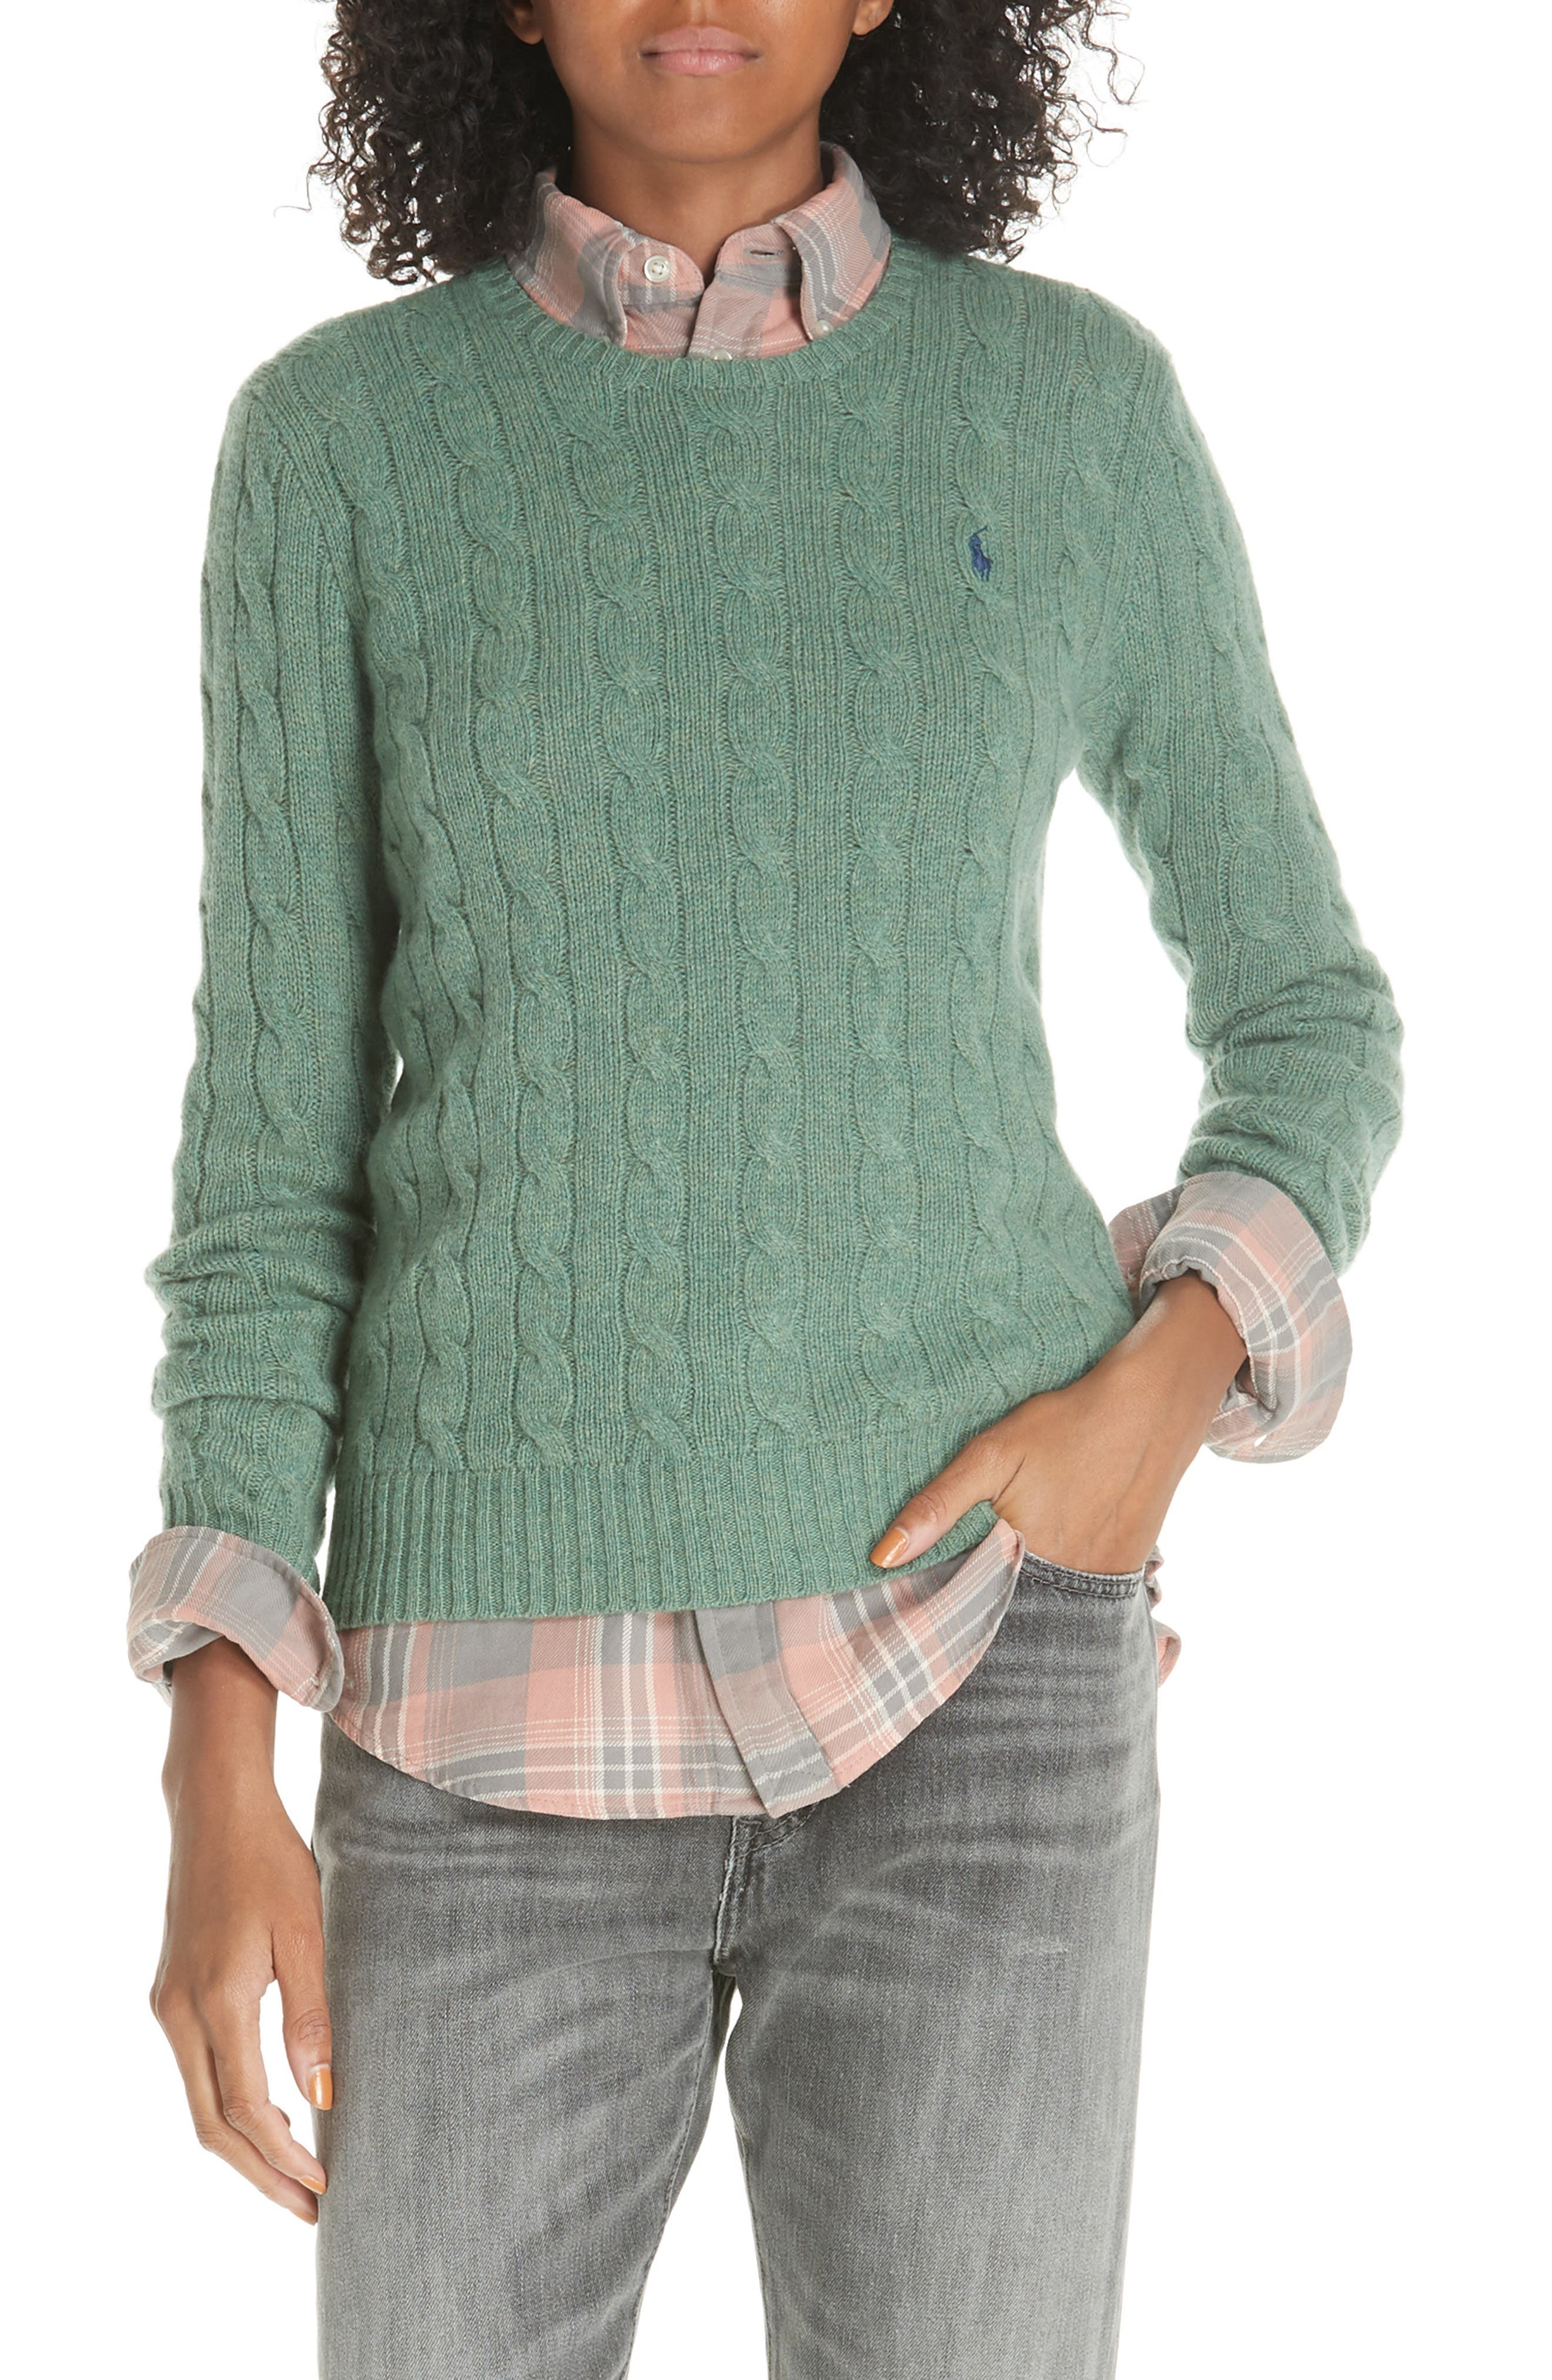 POLO RALPH LAUREN, Cable Knit Cotton Sweater, Main thumbnail 1, color, 300